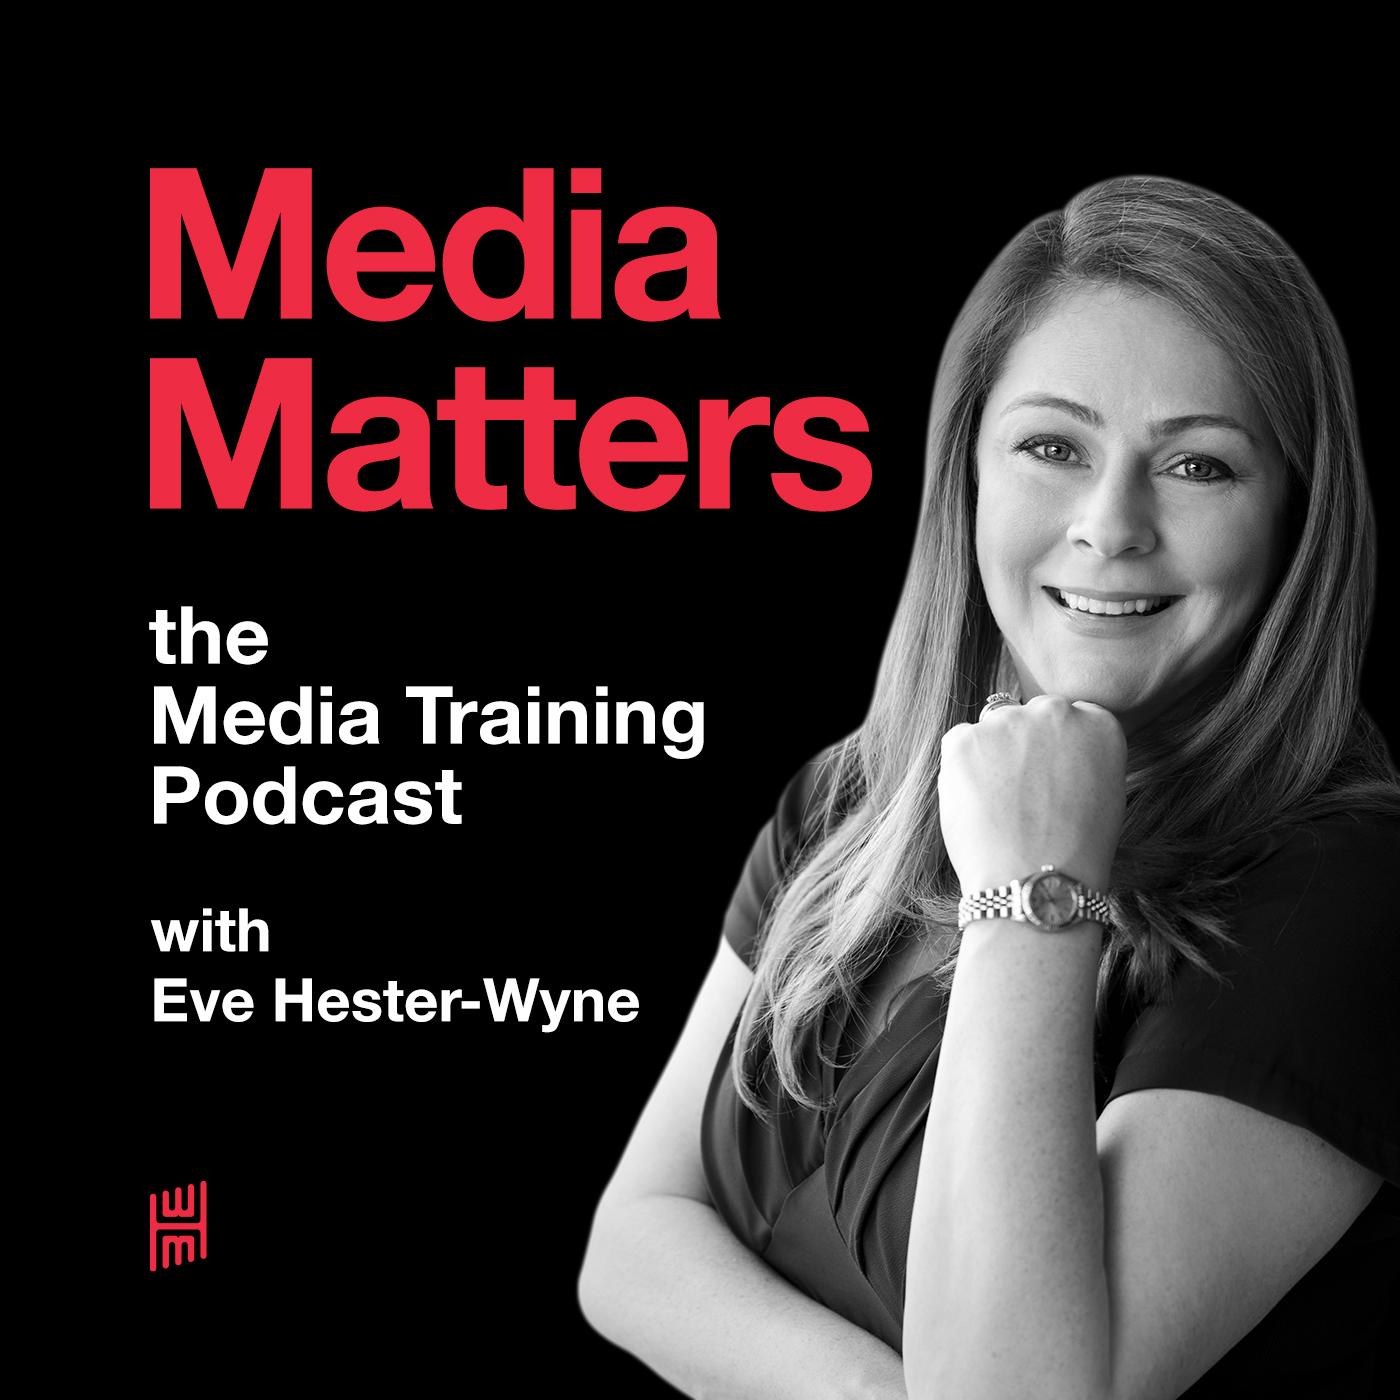 Media Matters: The Media Training Podcast show art